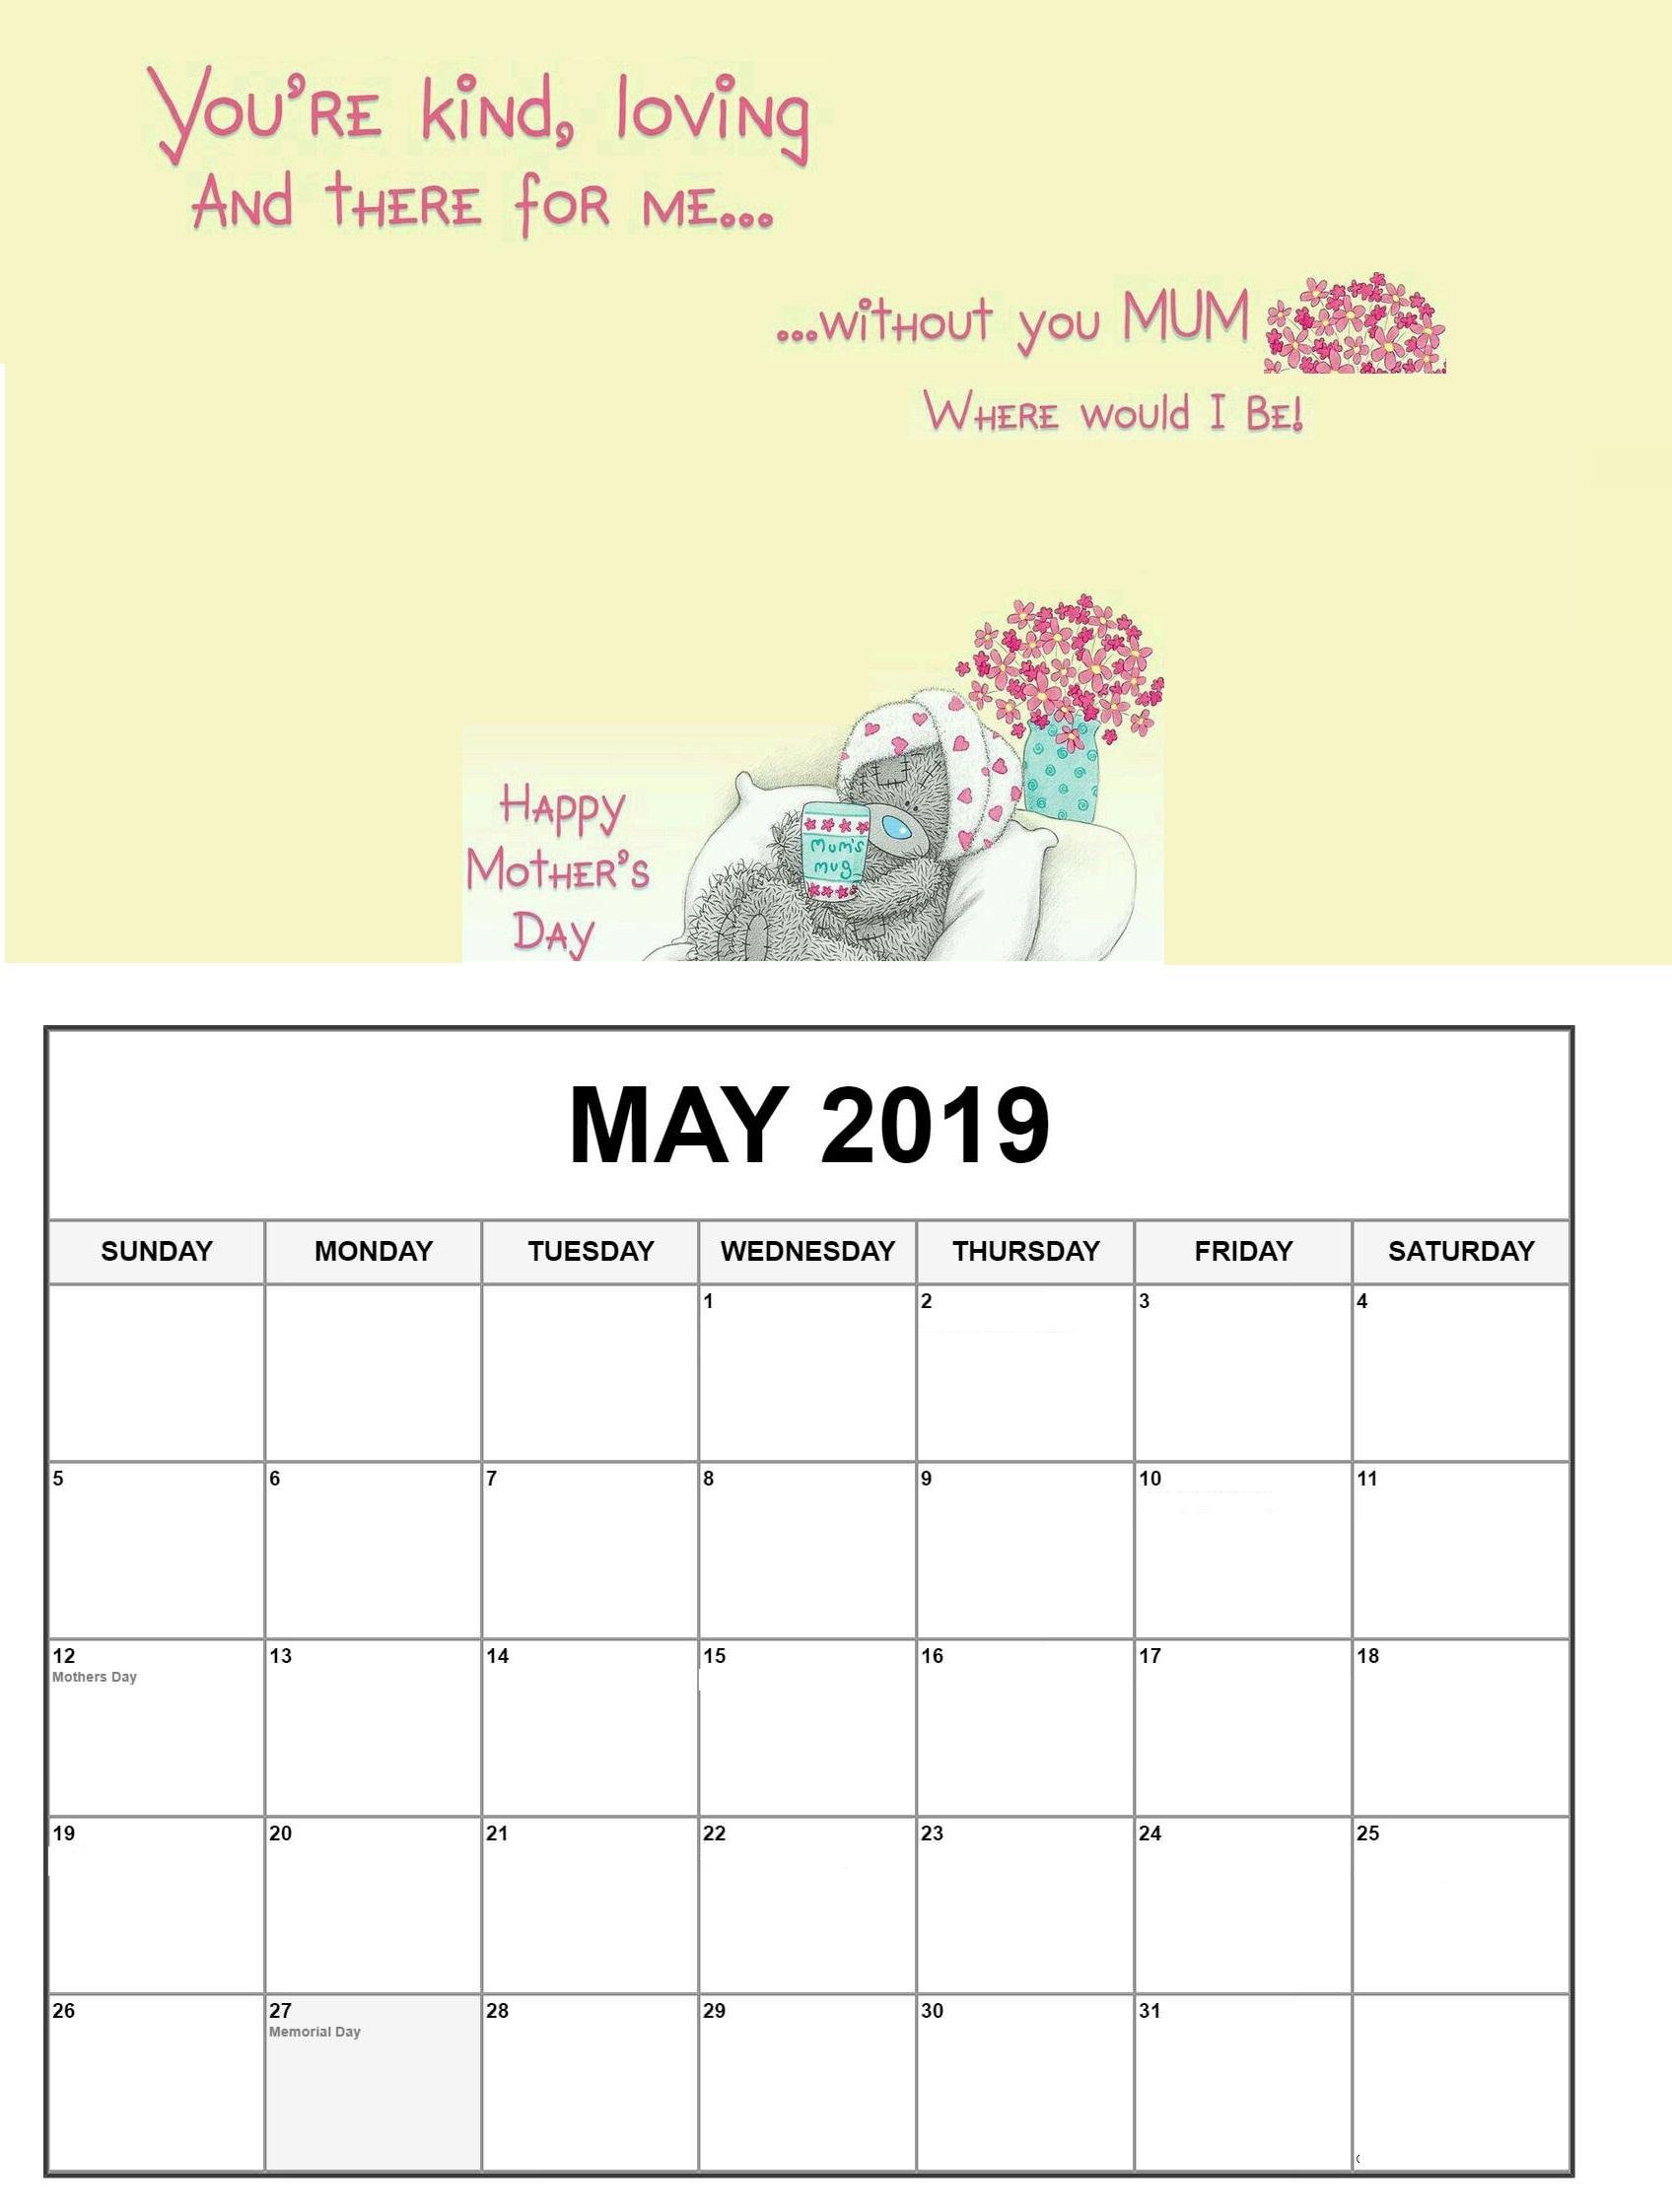 May 2019 Federal Holidays Calendar